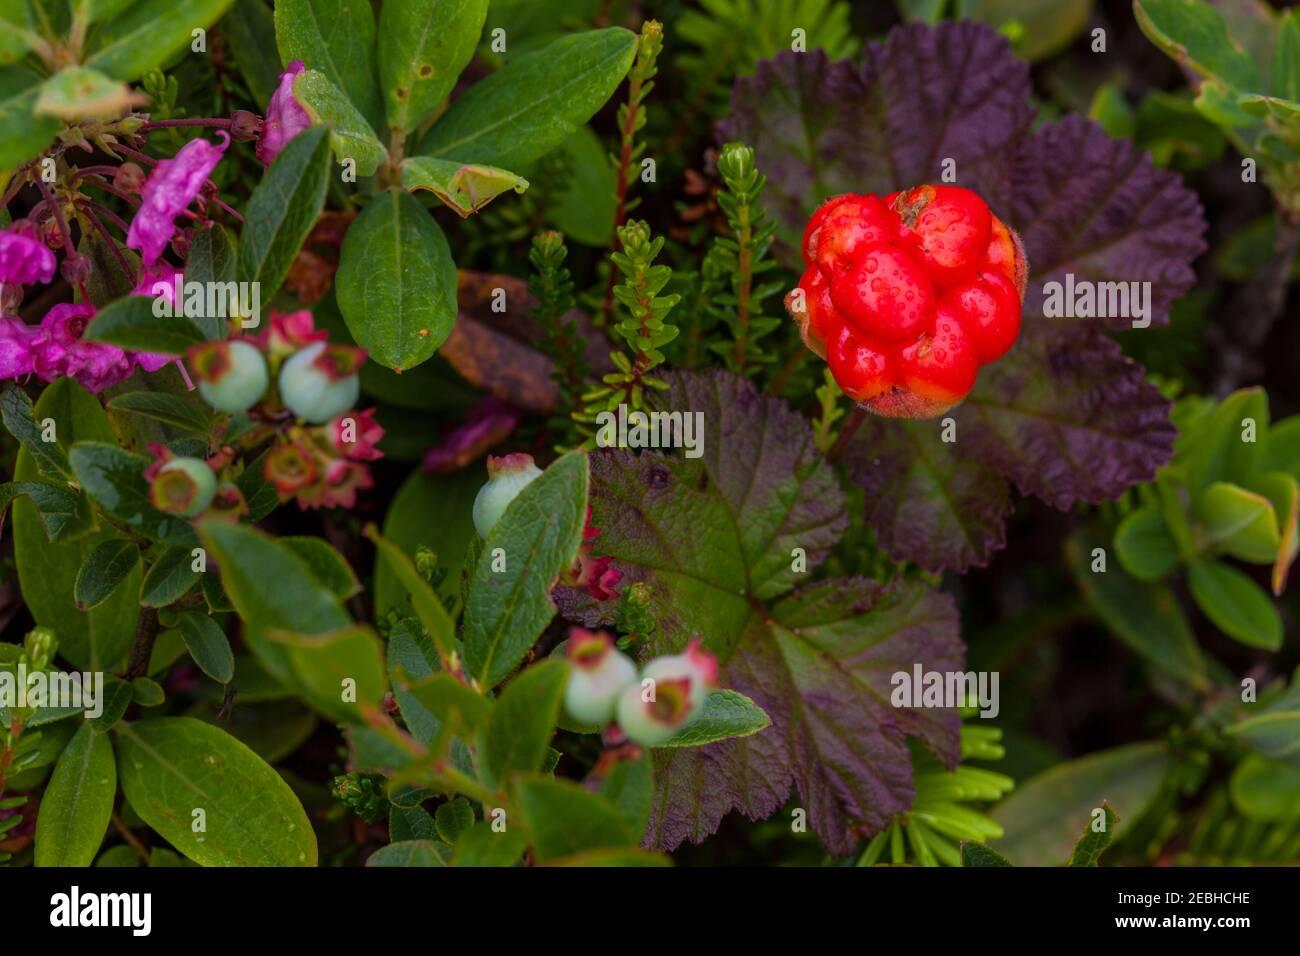 Bake Apple berry, cloudberry (rubus chamaemorus)<Newfoundland, Canadá Foto de stock